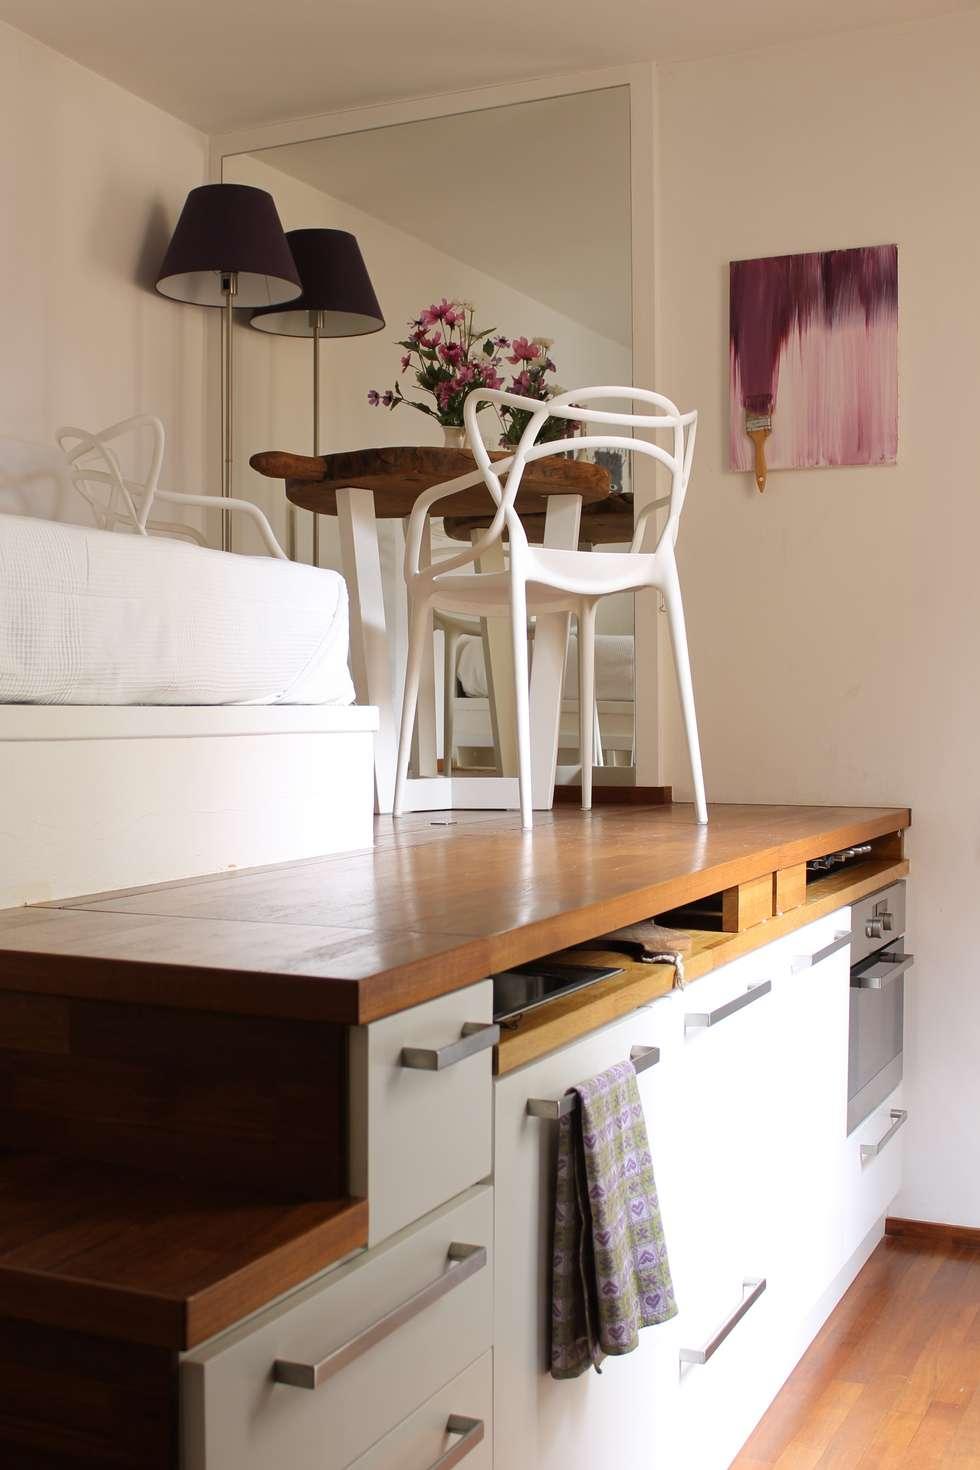 Cucina Mini Loft: Cucina in stile in stile Moderno di Arch. Silvana Citterio